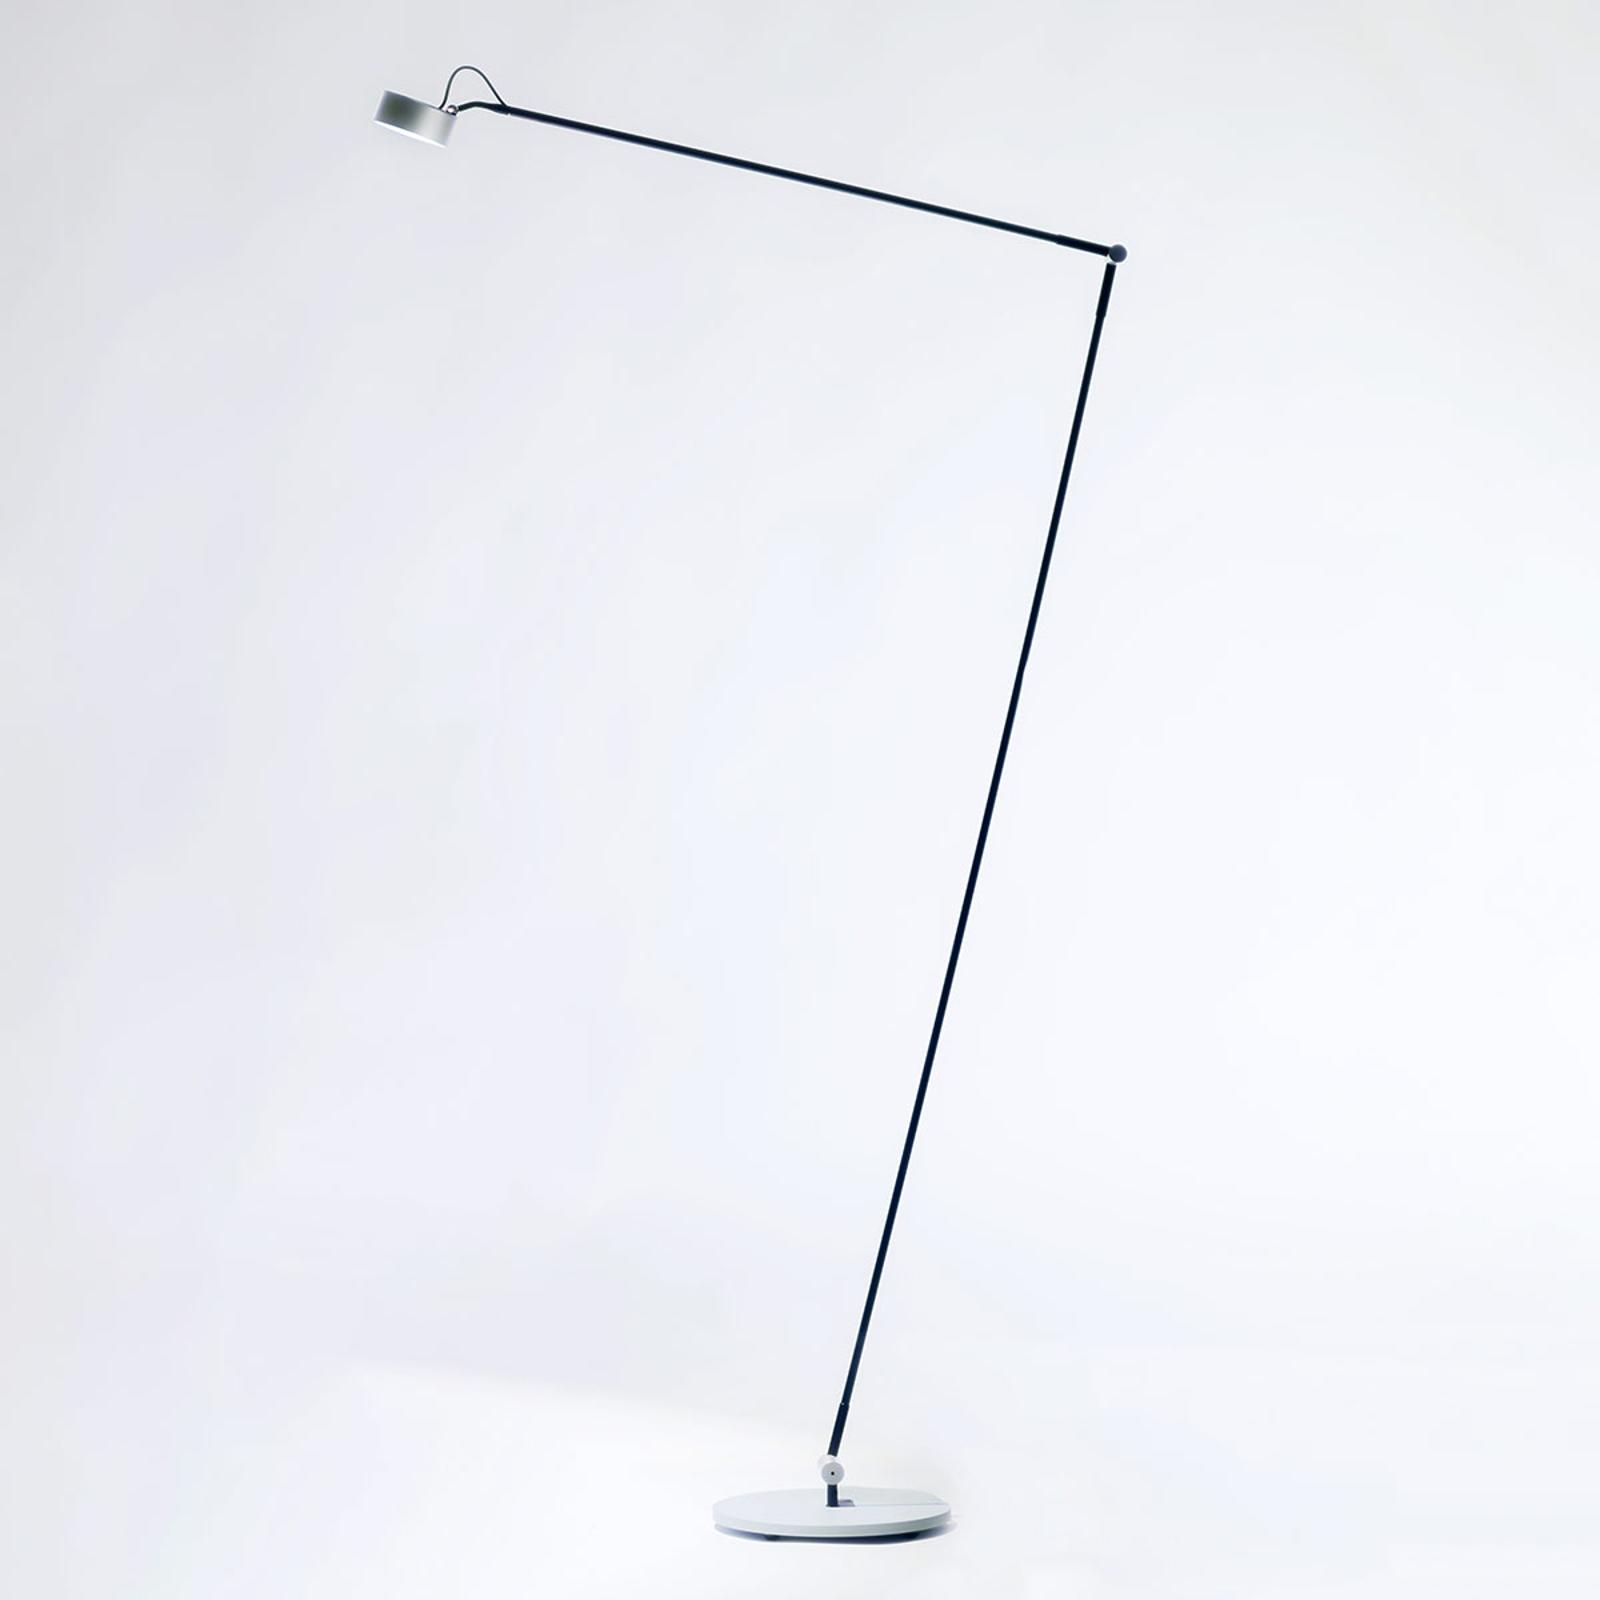 Lampa stojąca LED Basica 930 H wysięgnik, srebrna